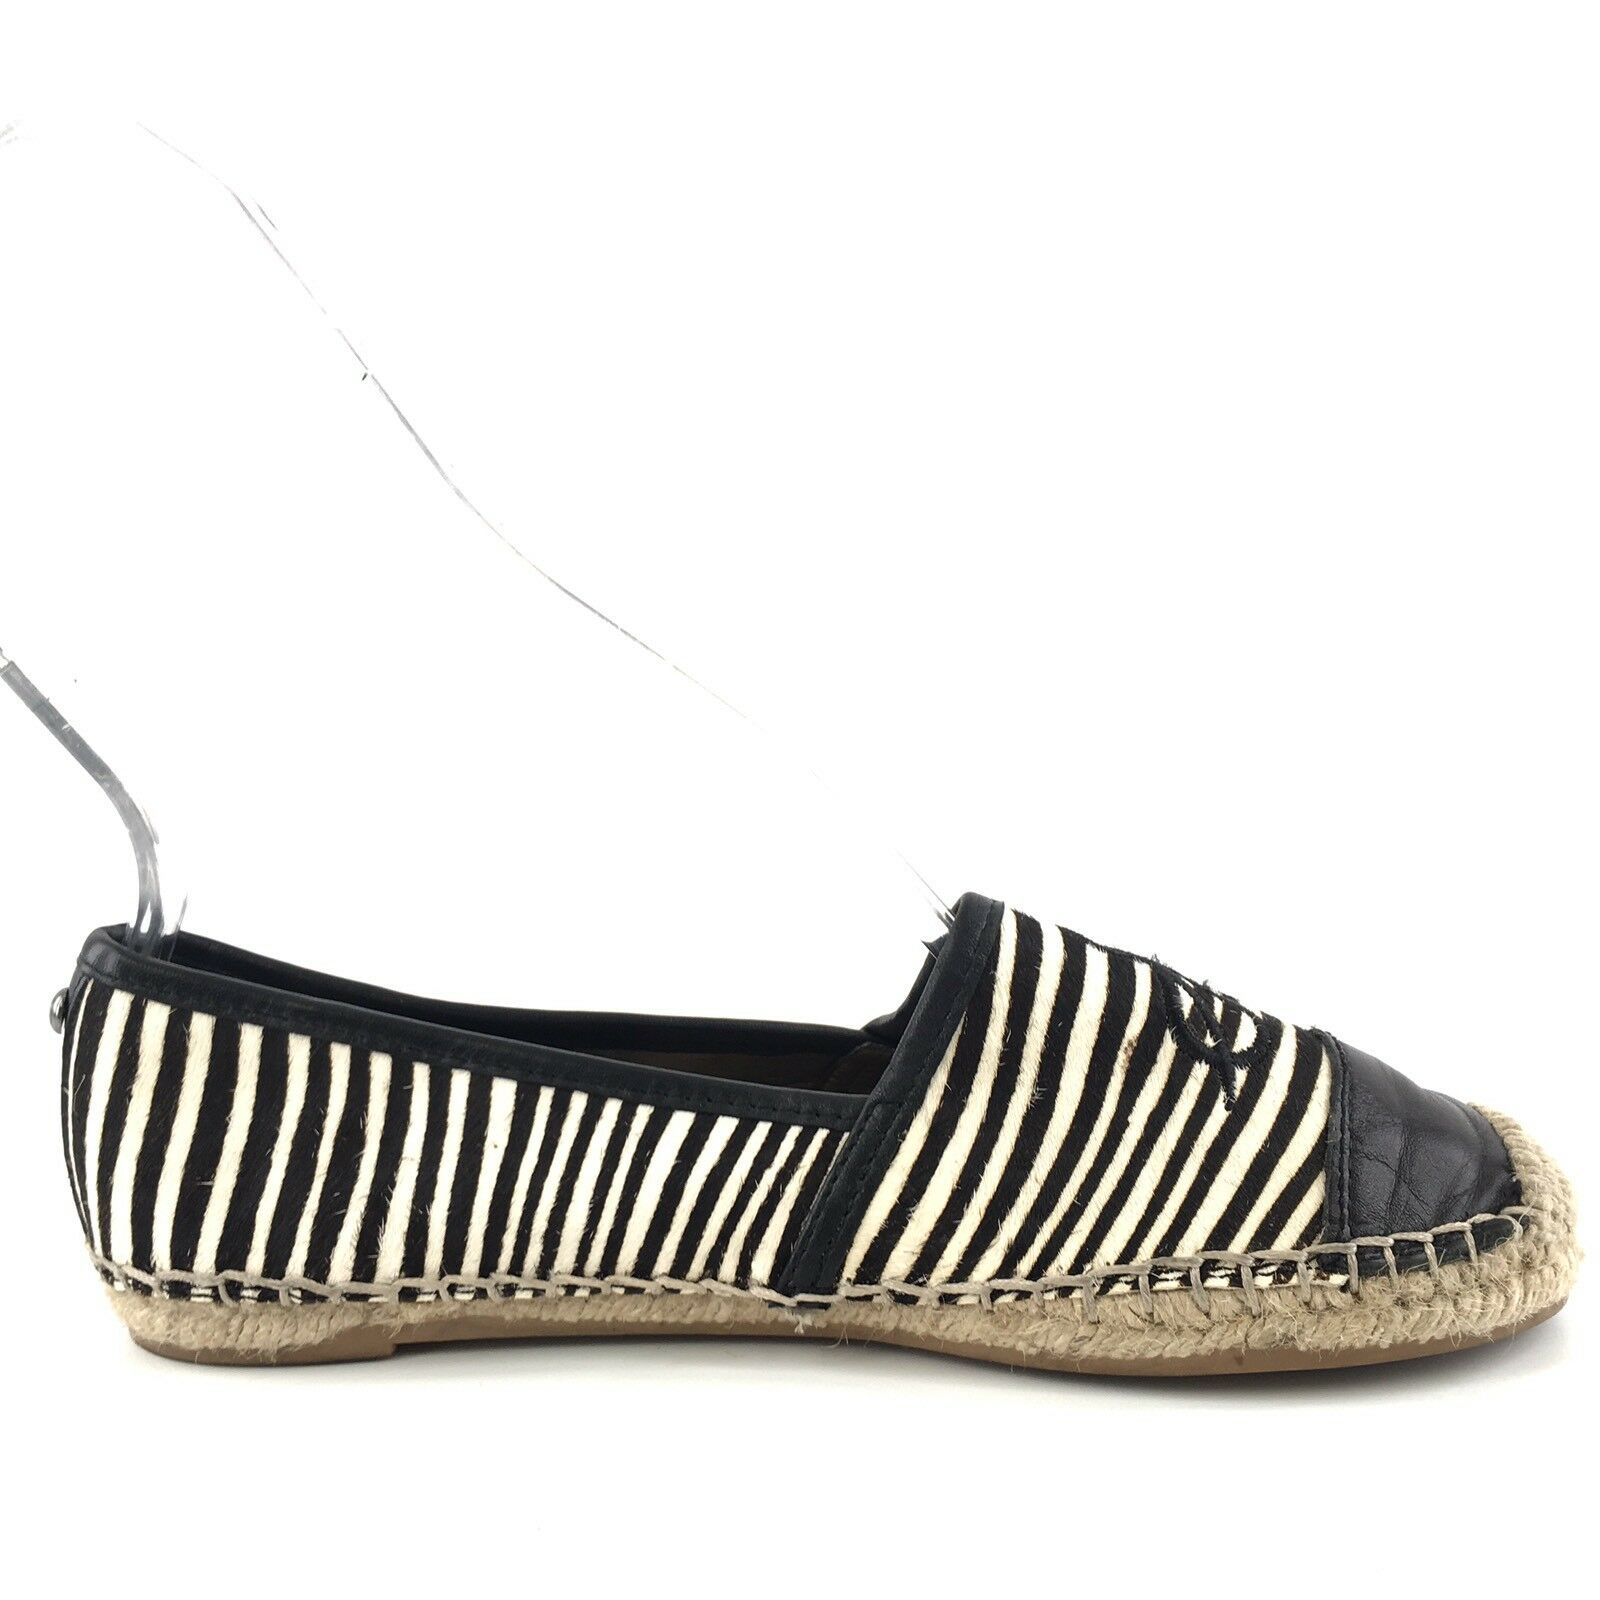 Sam Edelman  Lewis  Calf Hair Zebra Print Print Print Espadrille Flats Womens Size 6 M 8be0ed